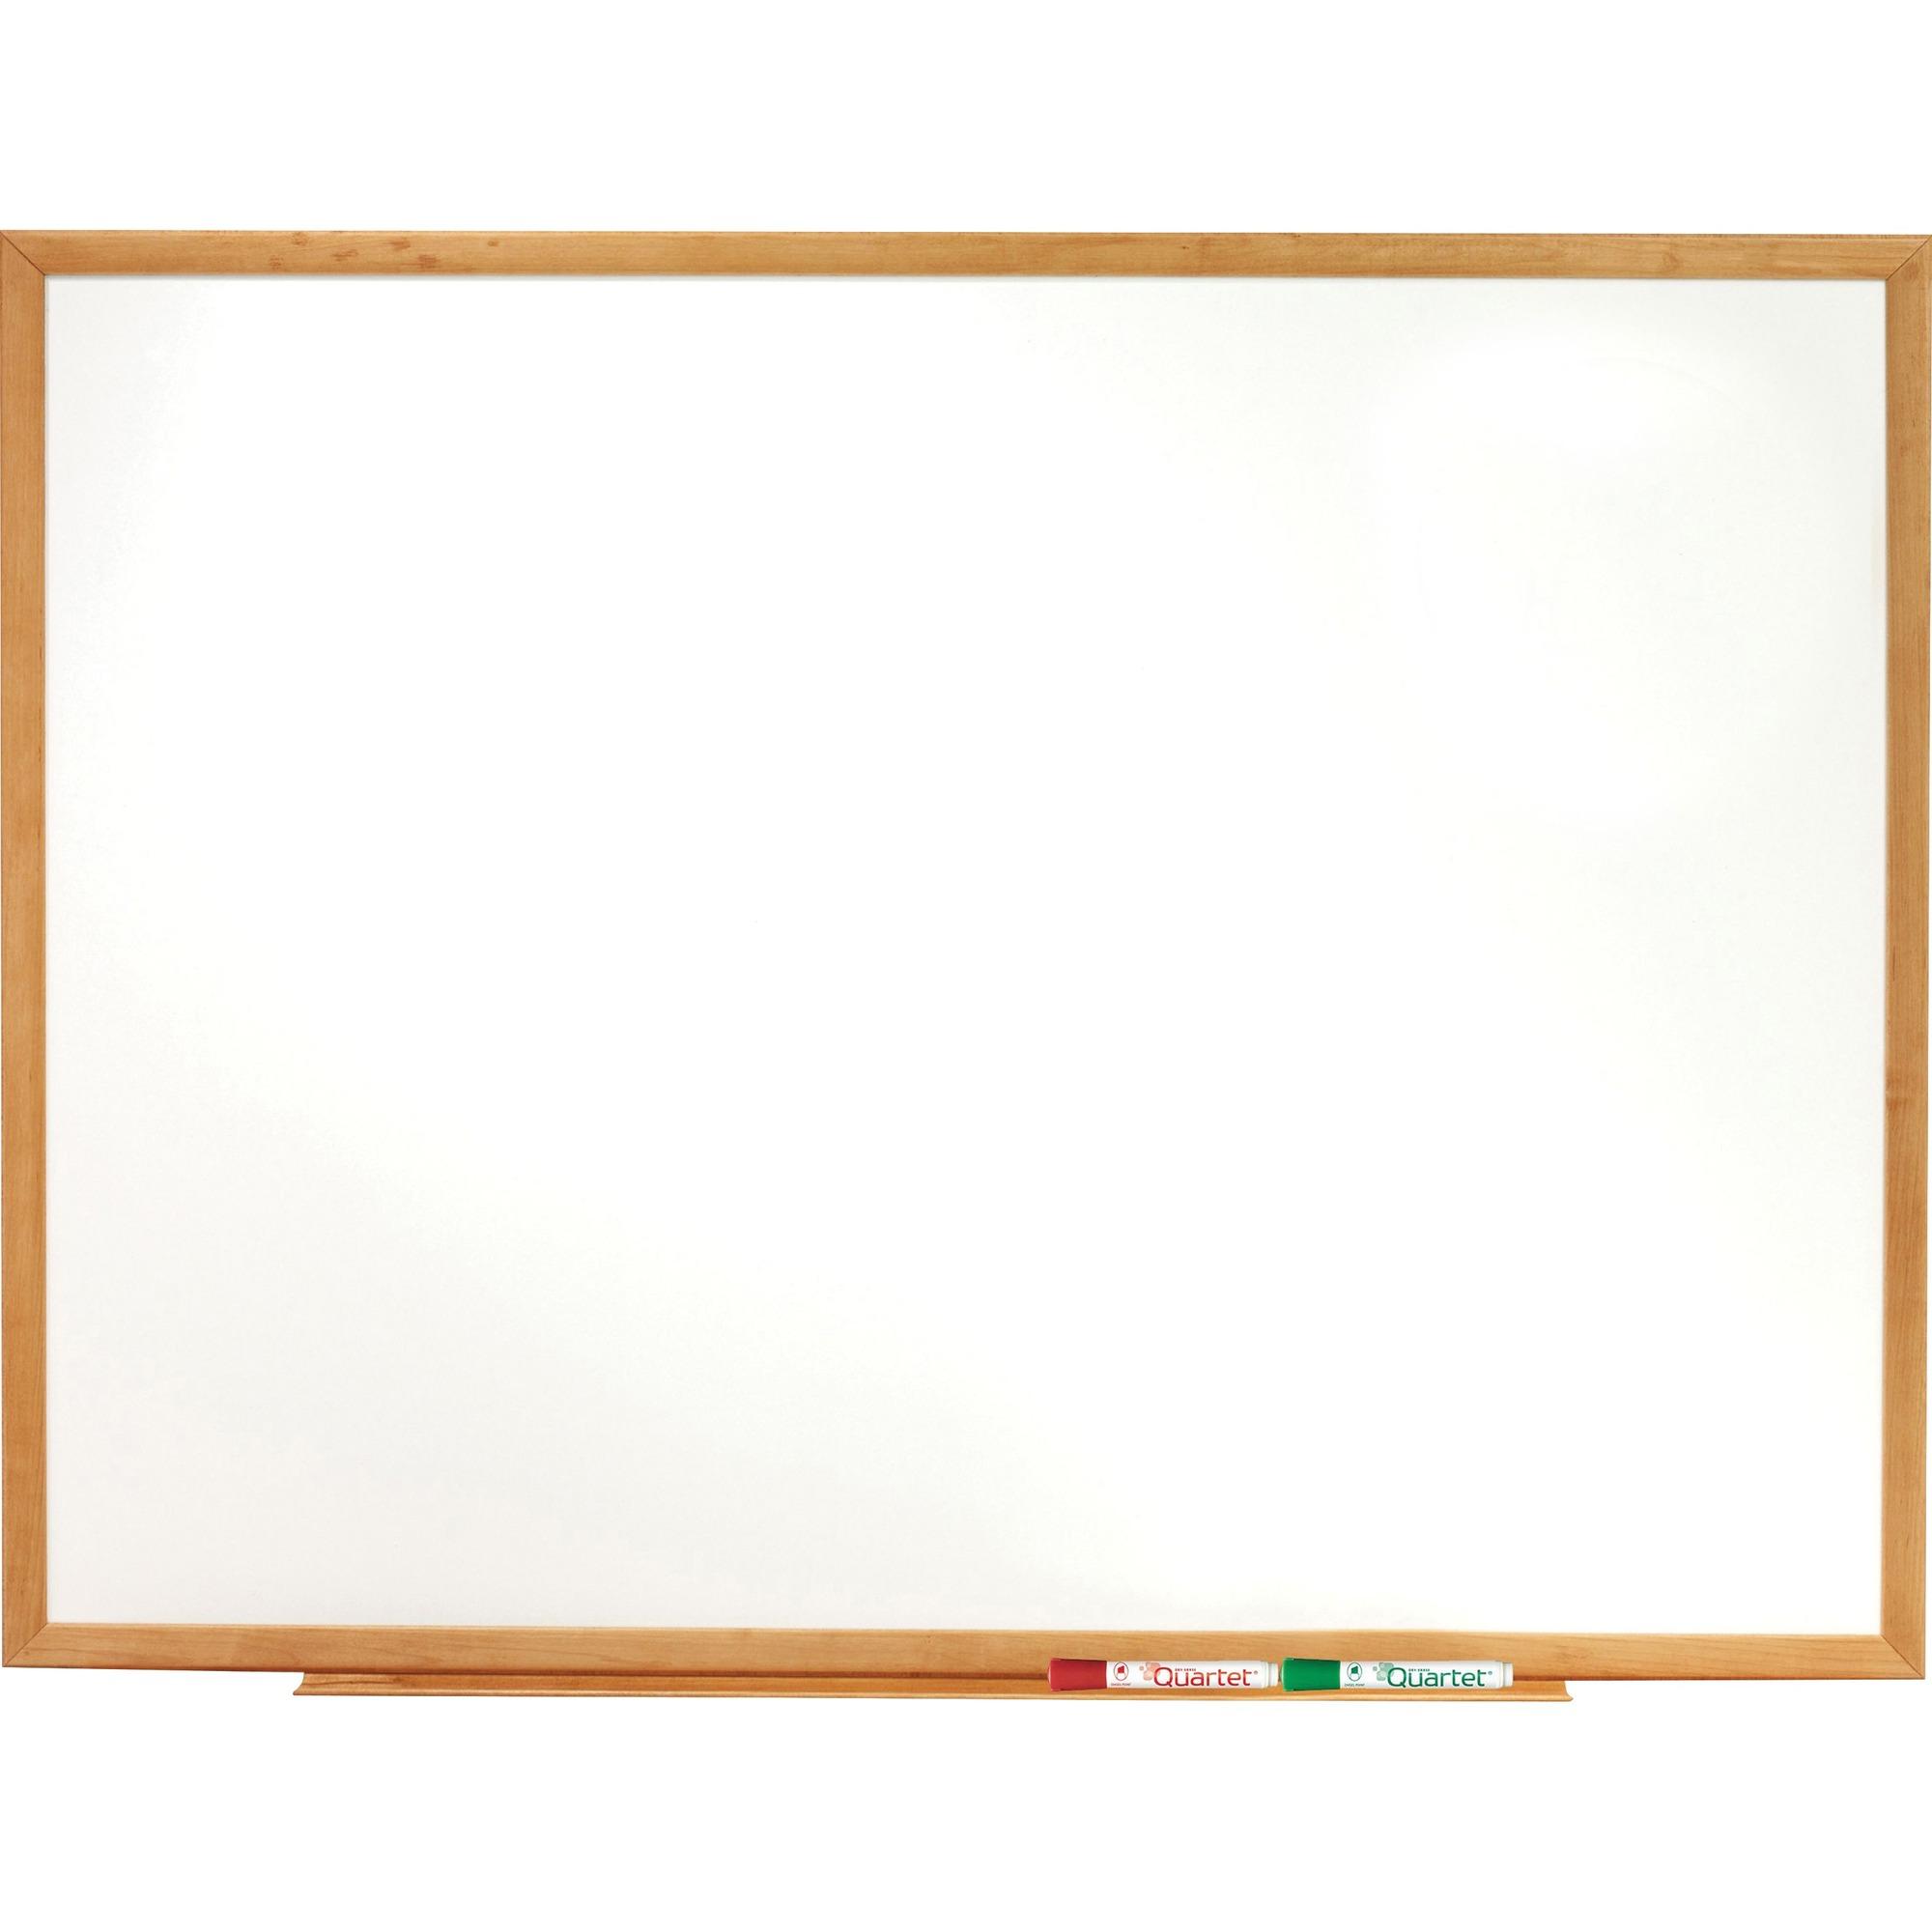 Acco Brands Corporation Quartet® Classic Whiteboard - 48 (4 Ft) Width X 36 (3 Ft) Height - White Melamine Surface - Oak Frame - Horizontal/vertical - 1 Each